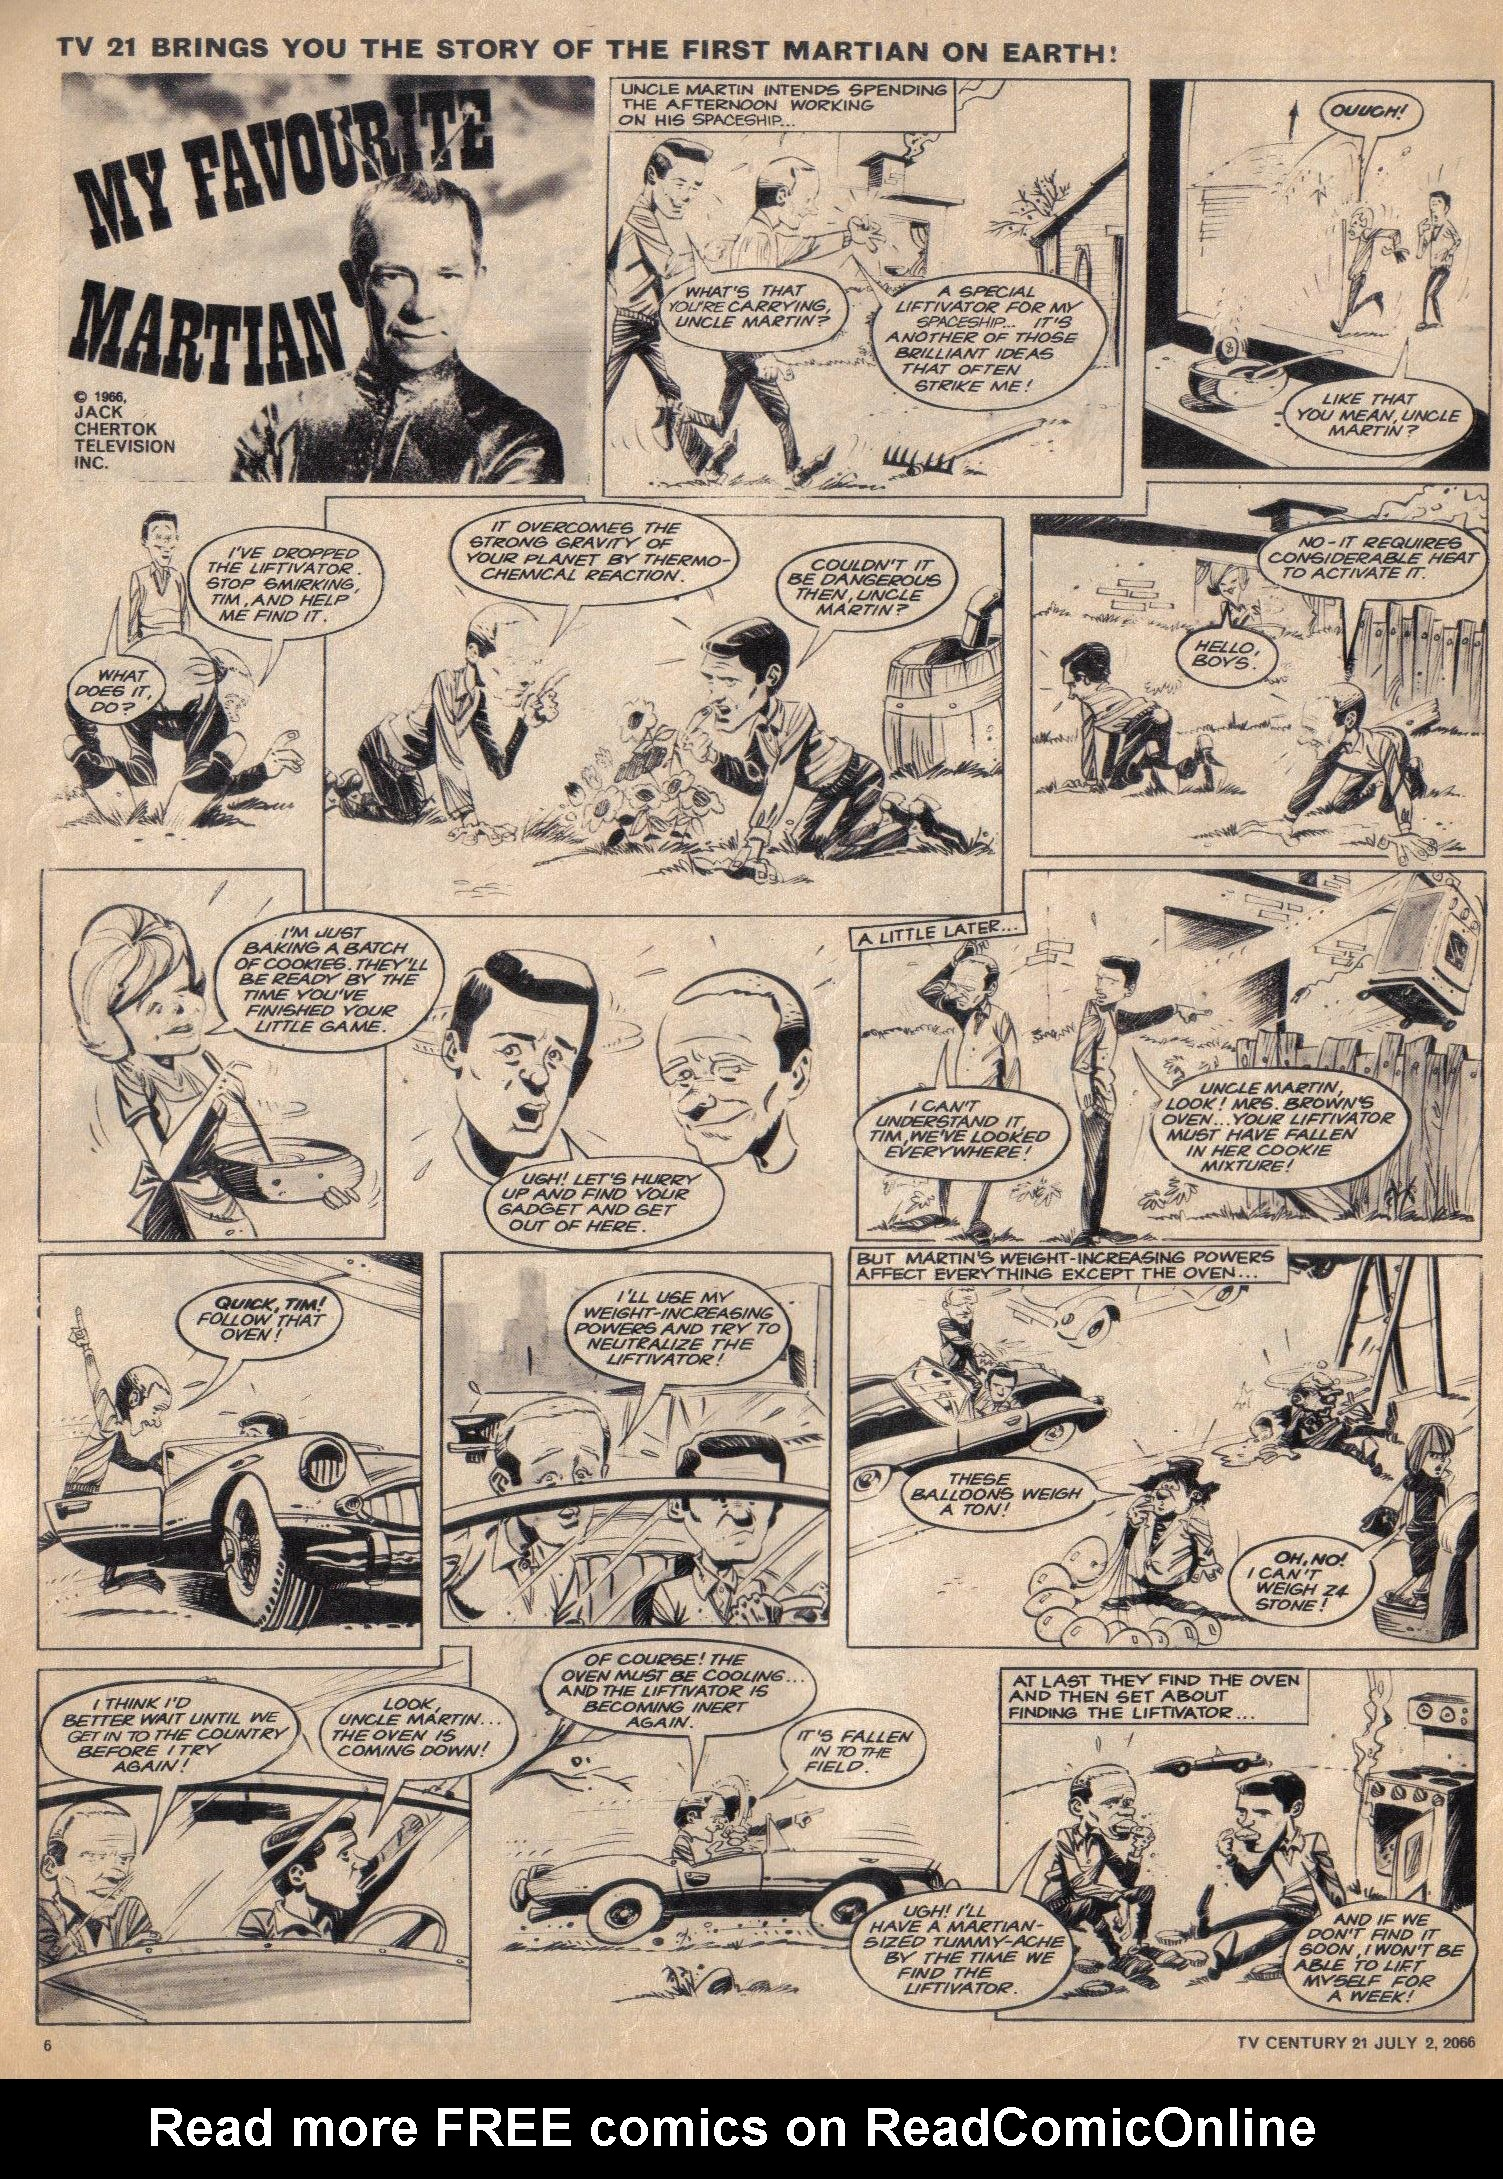 Read online TV Century 21 (TV 21) comic -  Issue #76 - 6